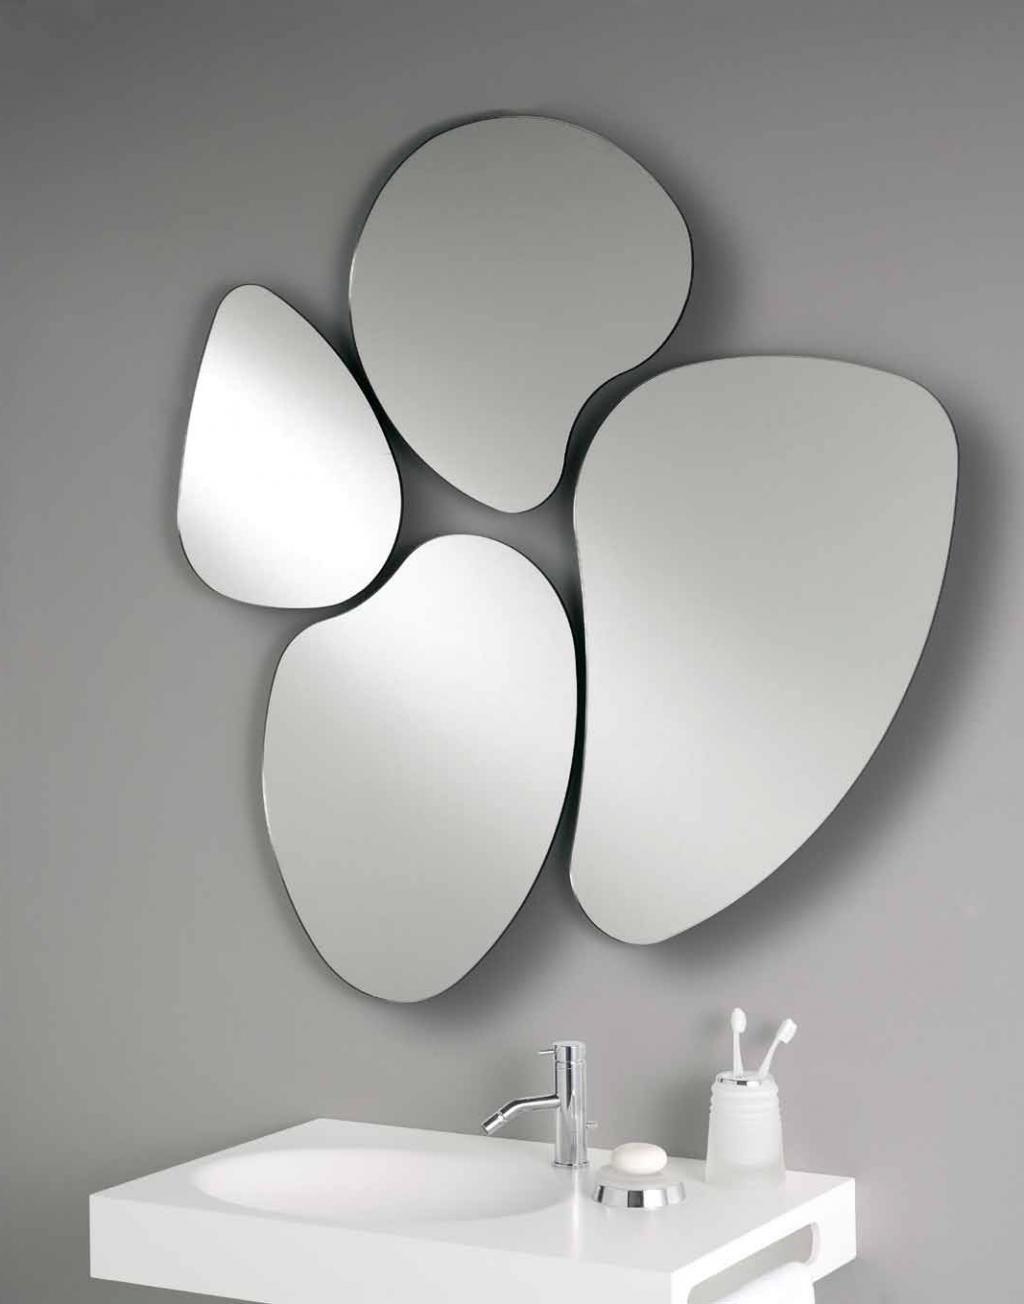 Funky Shaped Bathroom Mirrors Modern Mirror Wall Antique Mirror